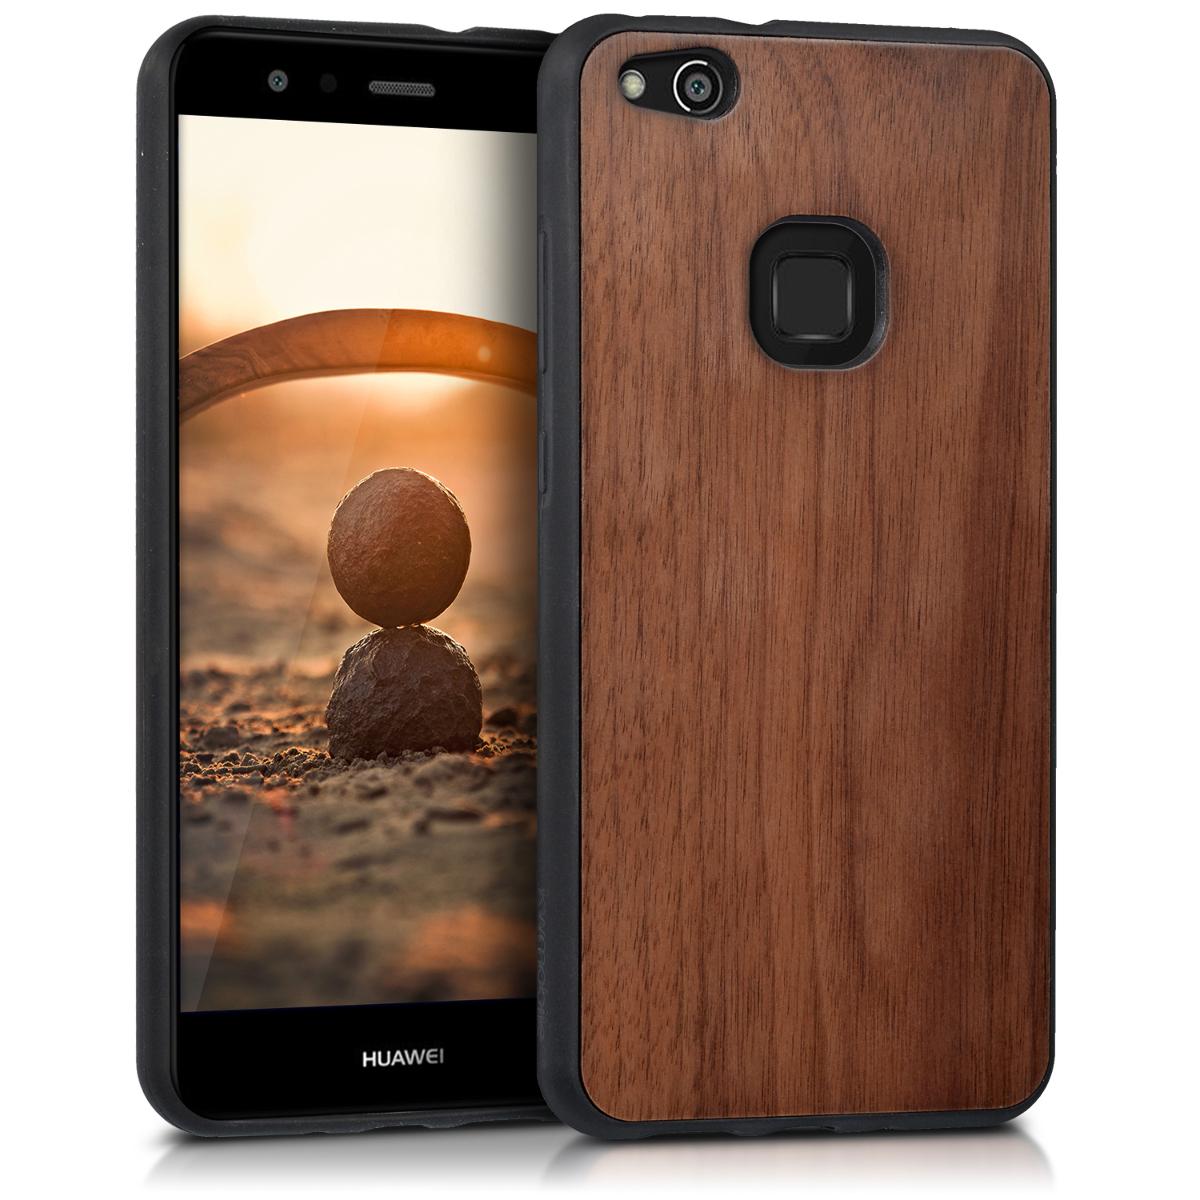 KW Σκληρή Ξύλινη Θήκη Huawei P10 Lite - Dark Brown - (41376.18)